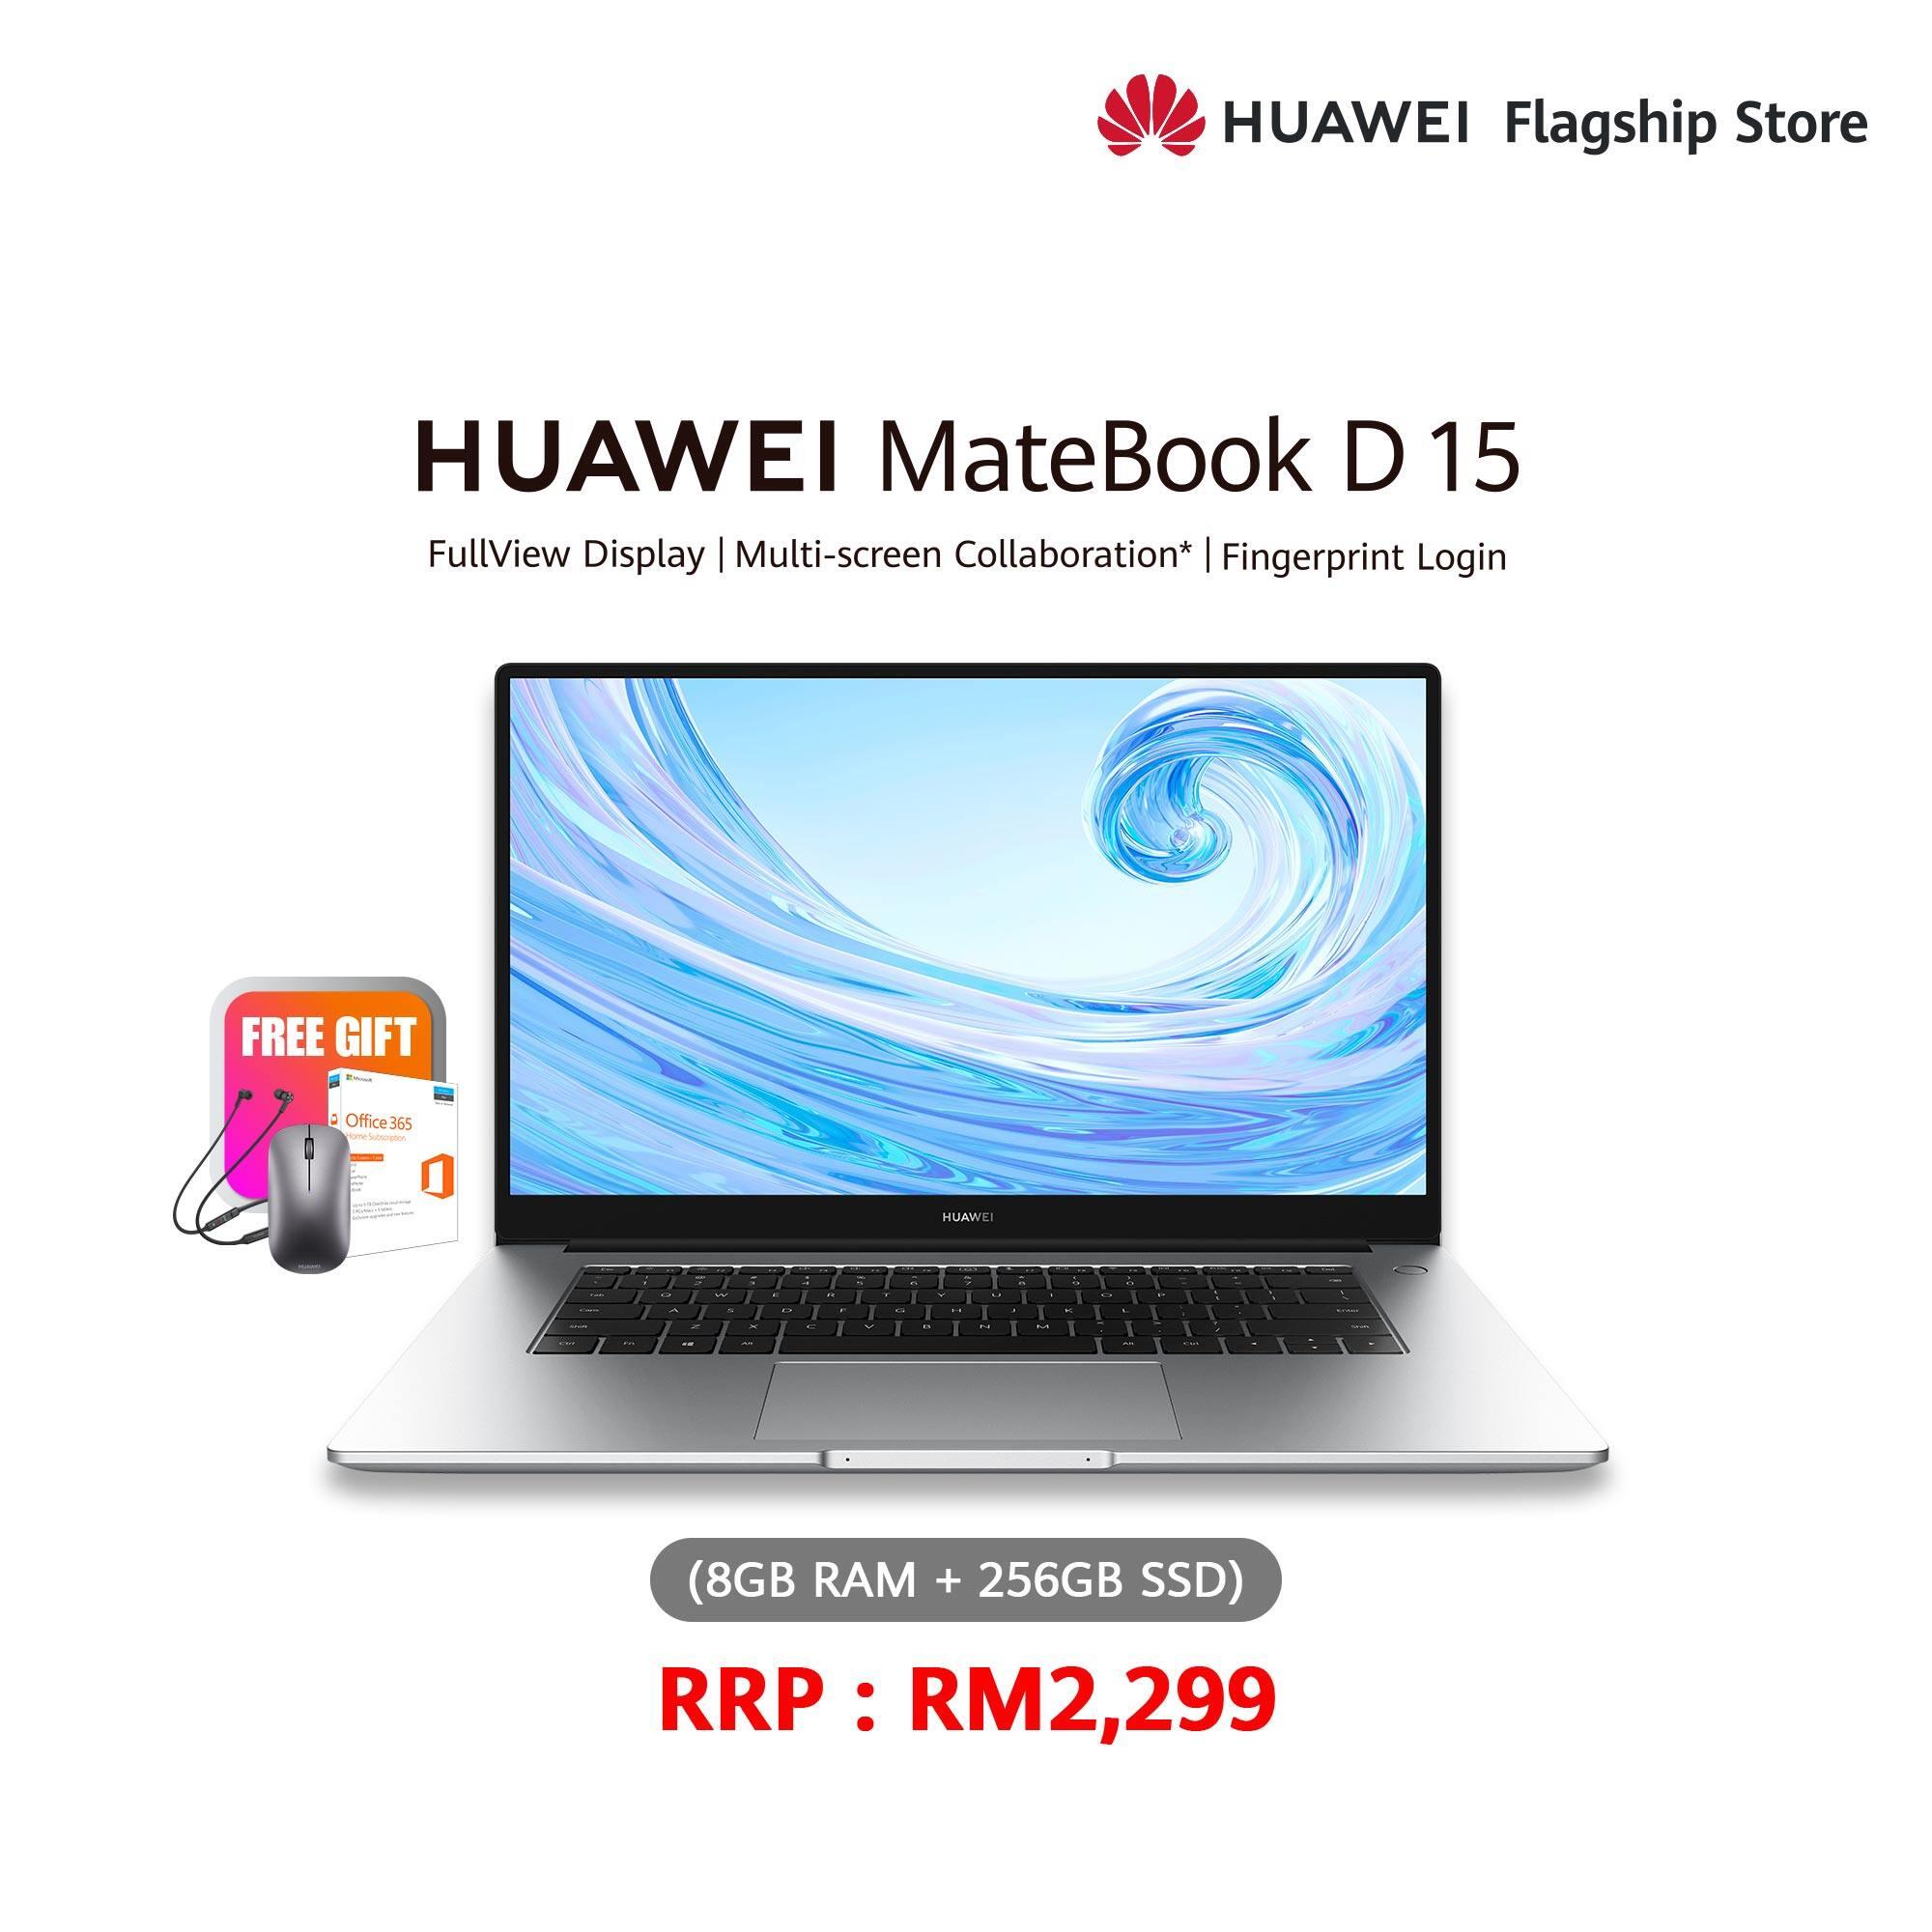 [PREORDER] HUAWEI MATEBOOK D 15 (8+256) FREE GIFT Freelace + FREEGIFT mouse + FREEGIFT Microsoft 365 ETA 4th March 2020 Malaysia